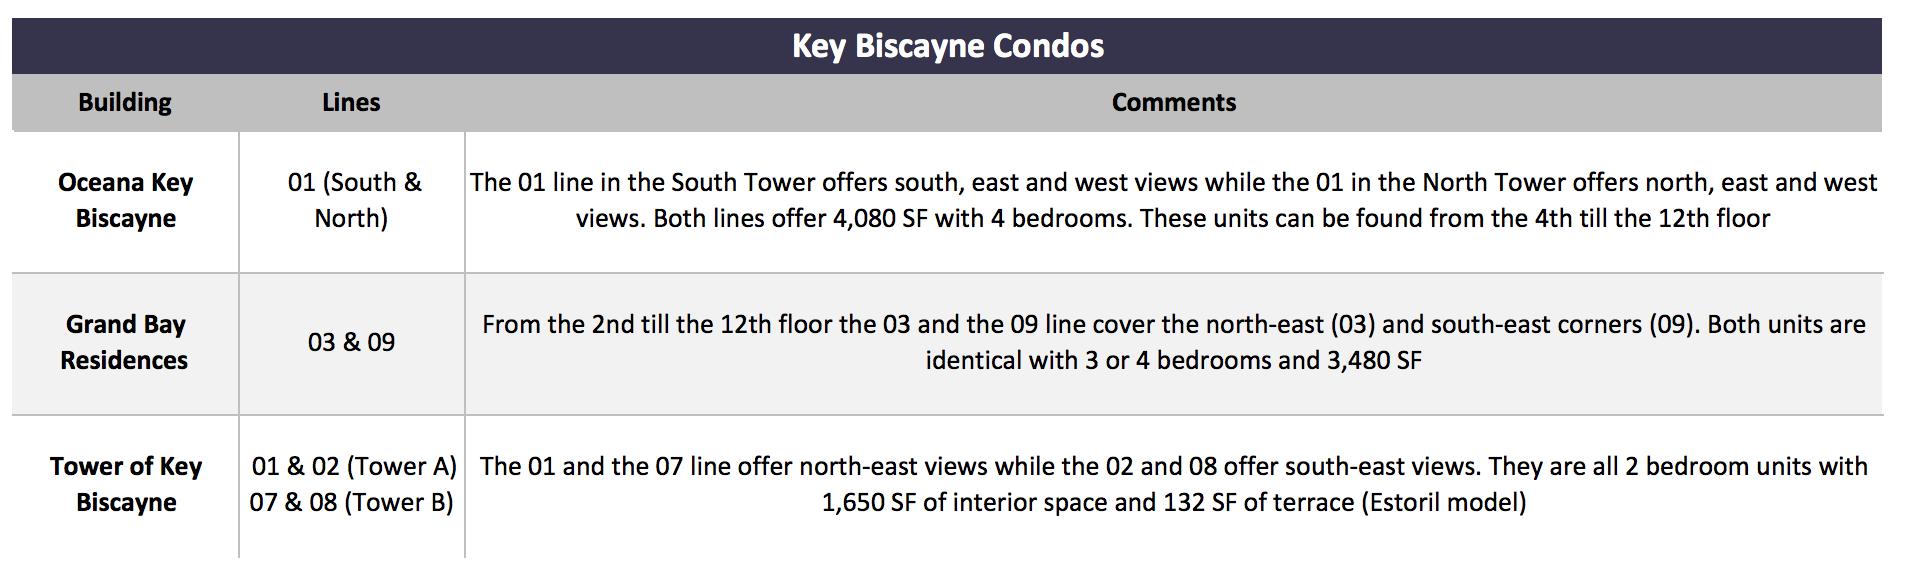 Miami Condo Investments | The Importance of Unique Floor Plans